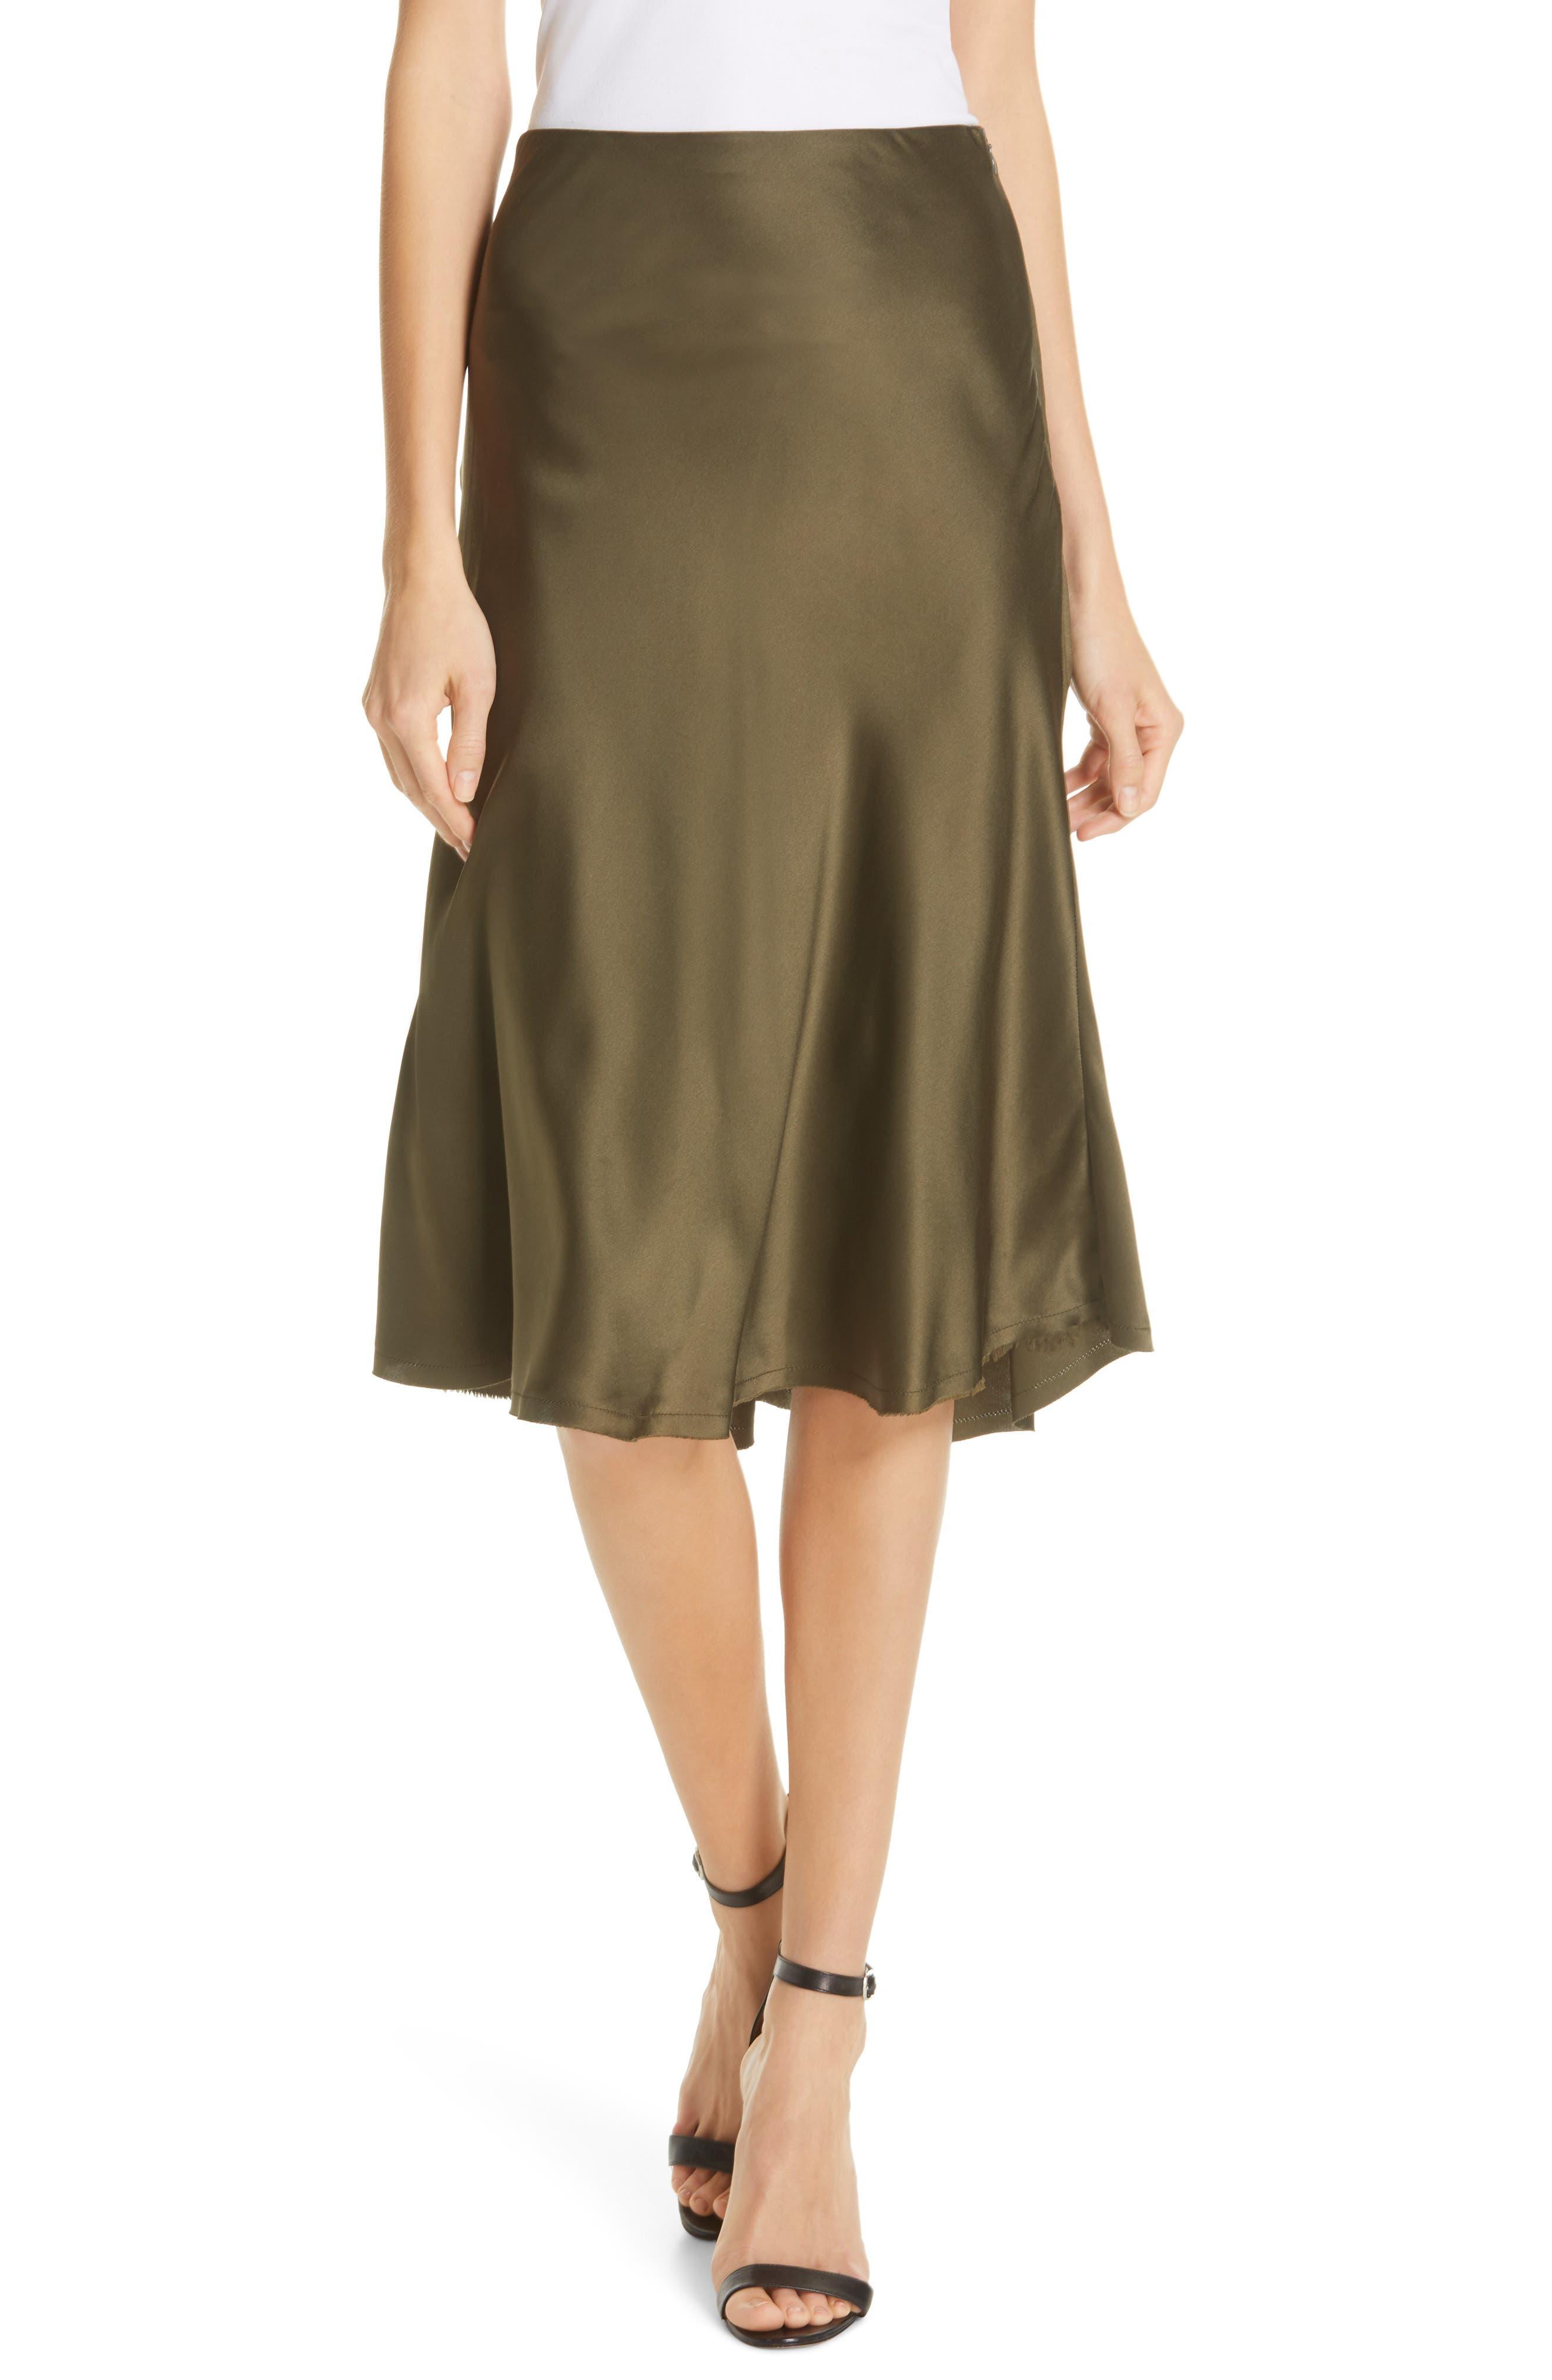 NILI LOTAN, Lane Silk Skirt, Main thumbnail 1, color, ARMY GREEN